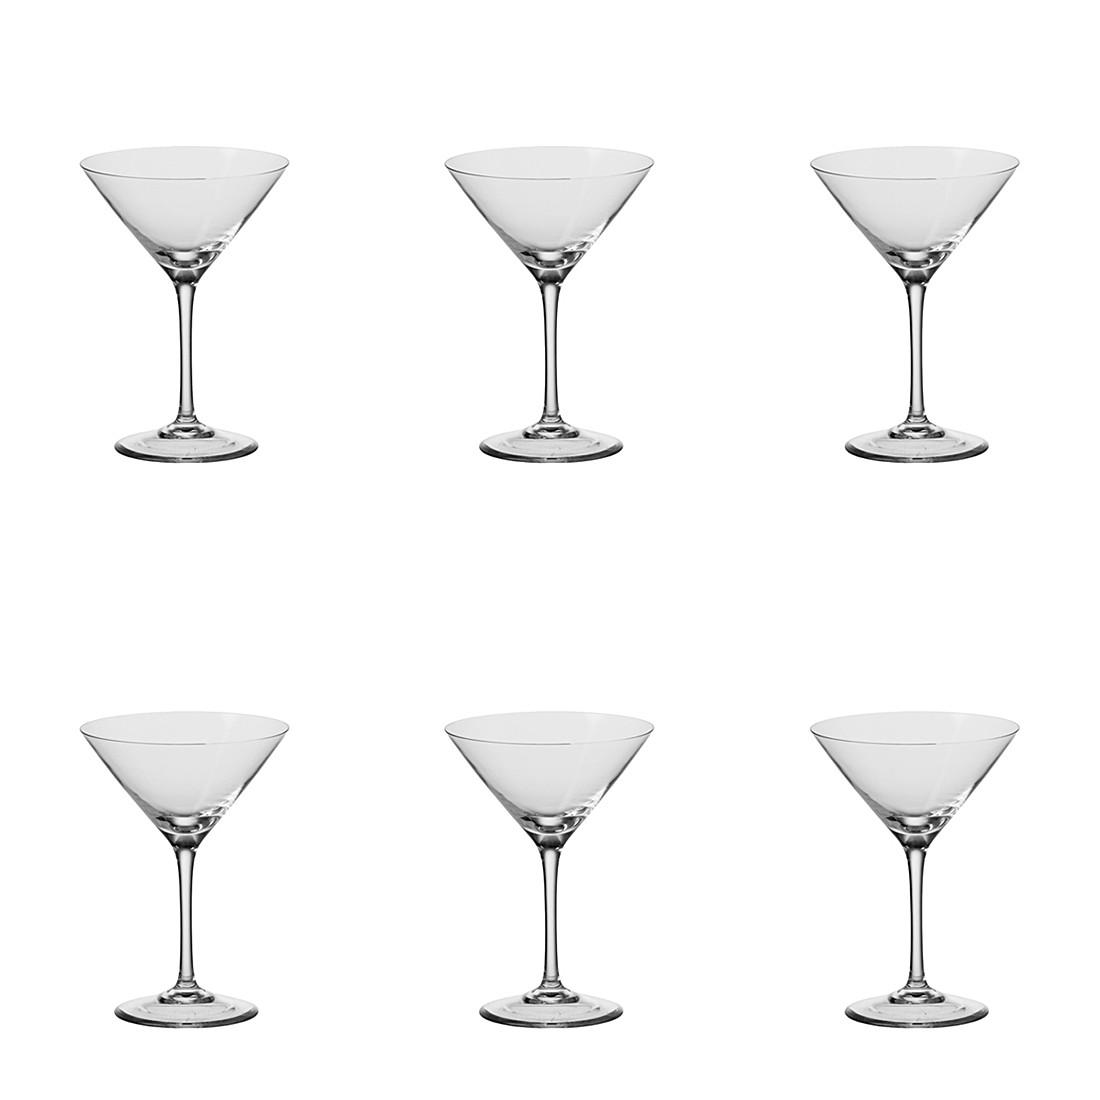 Cocktailglas Ciao+ (6er-Set), Leonardo jetzt bestellen